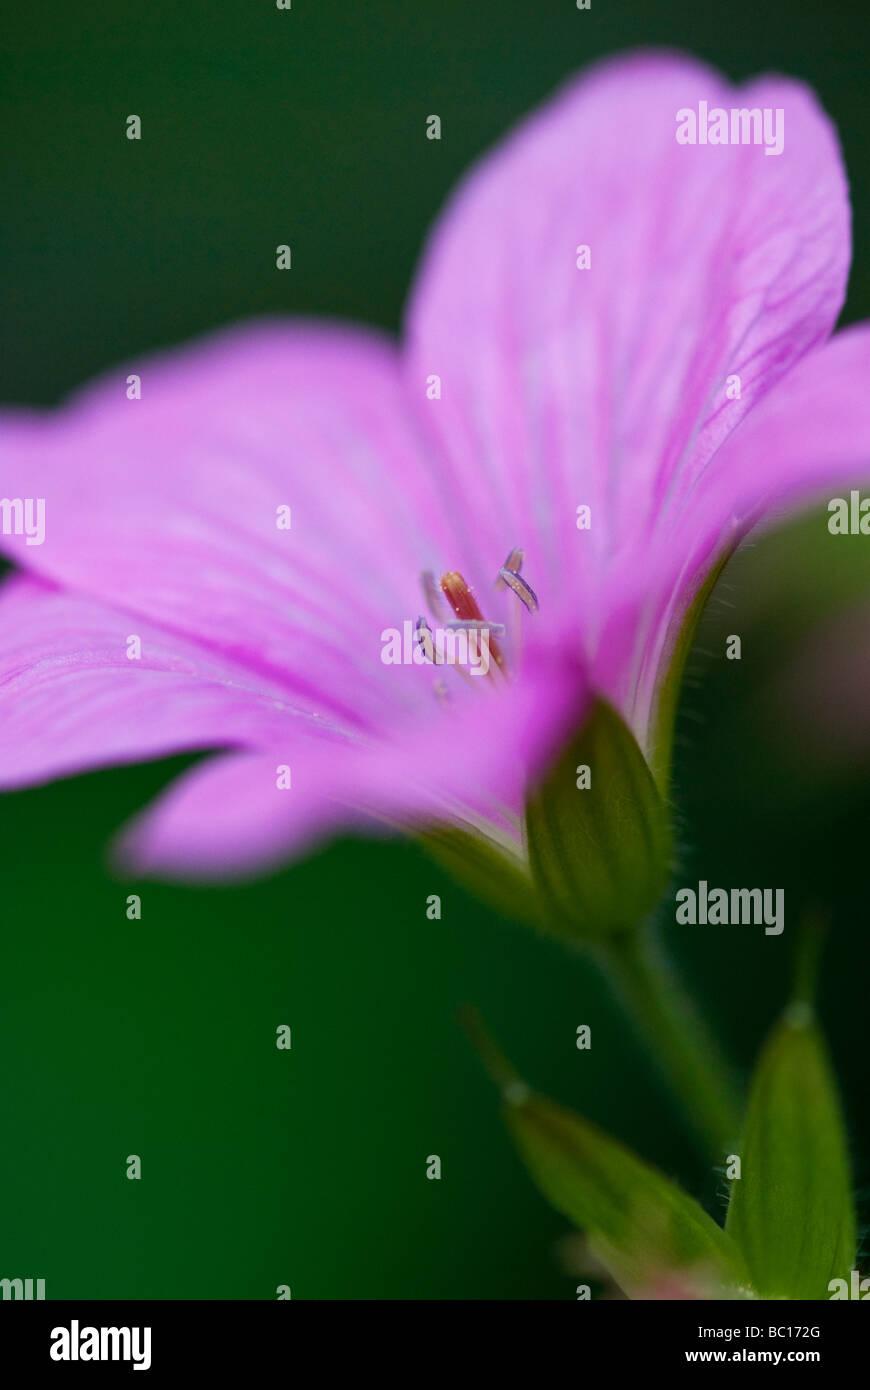 Geranium endressii, Wargrave Pink. Macro shot of a single flowerhead. - Stock Image